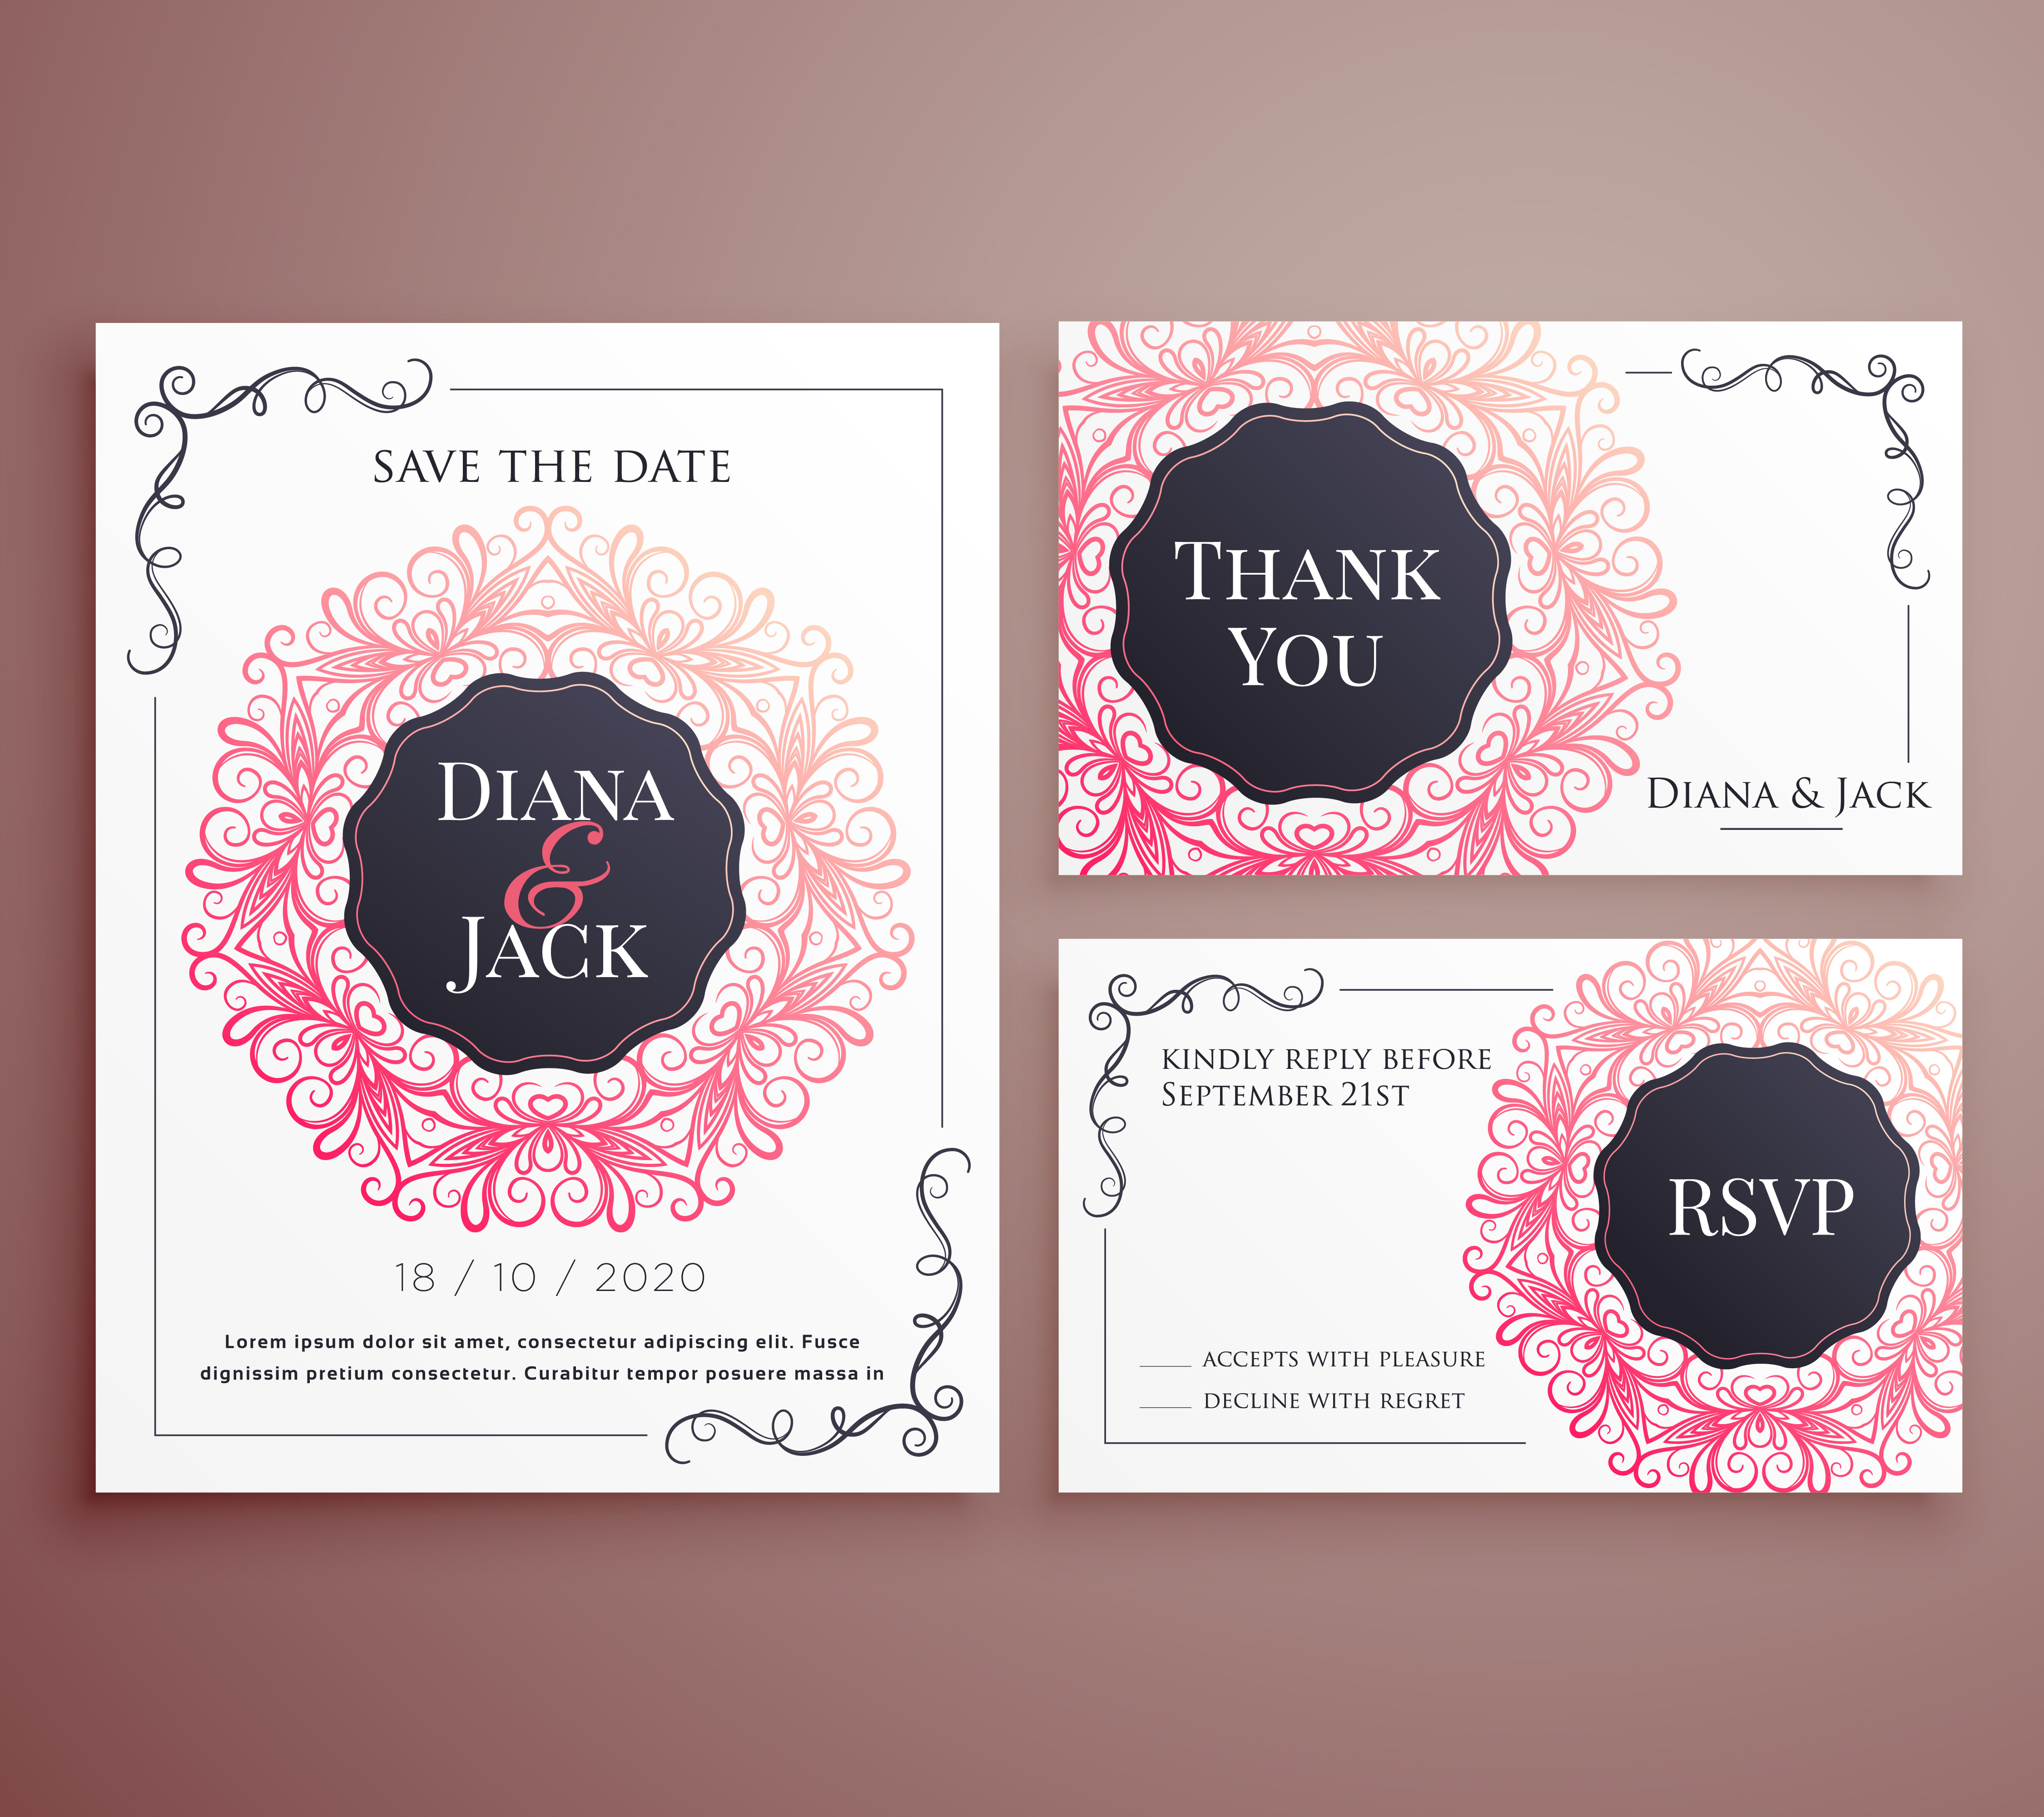 wedding invitation card template design set download free vector art stock graphics images. Black Bedroom Furniture Sets. Home Design Ideas